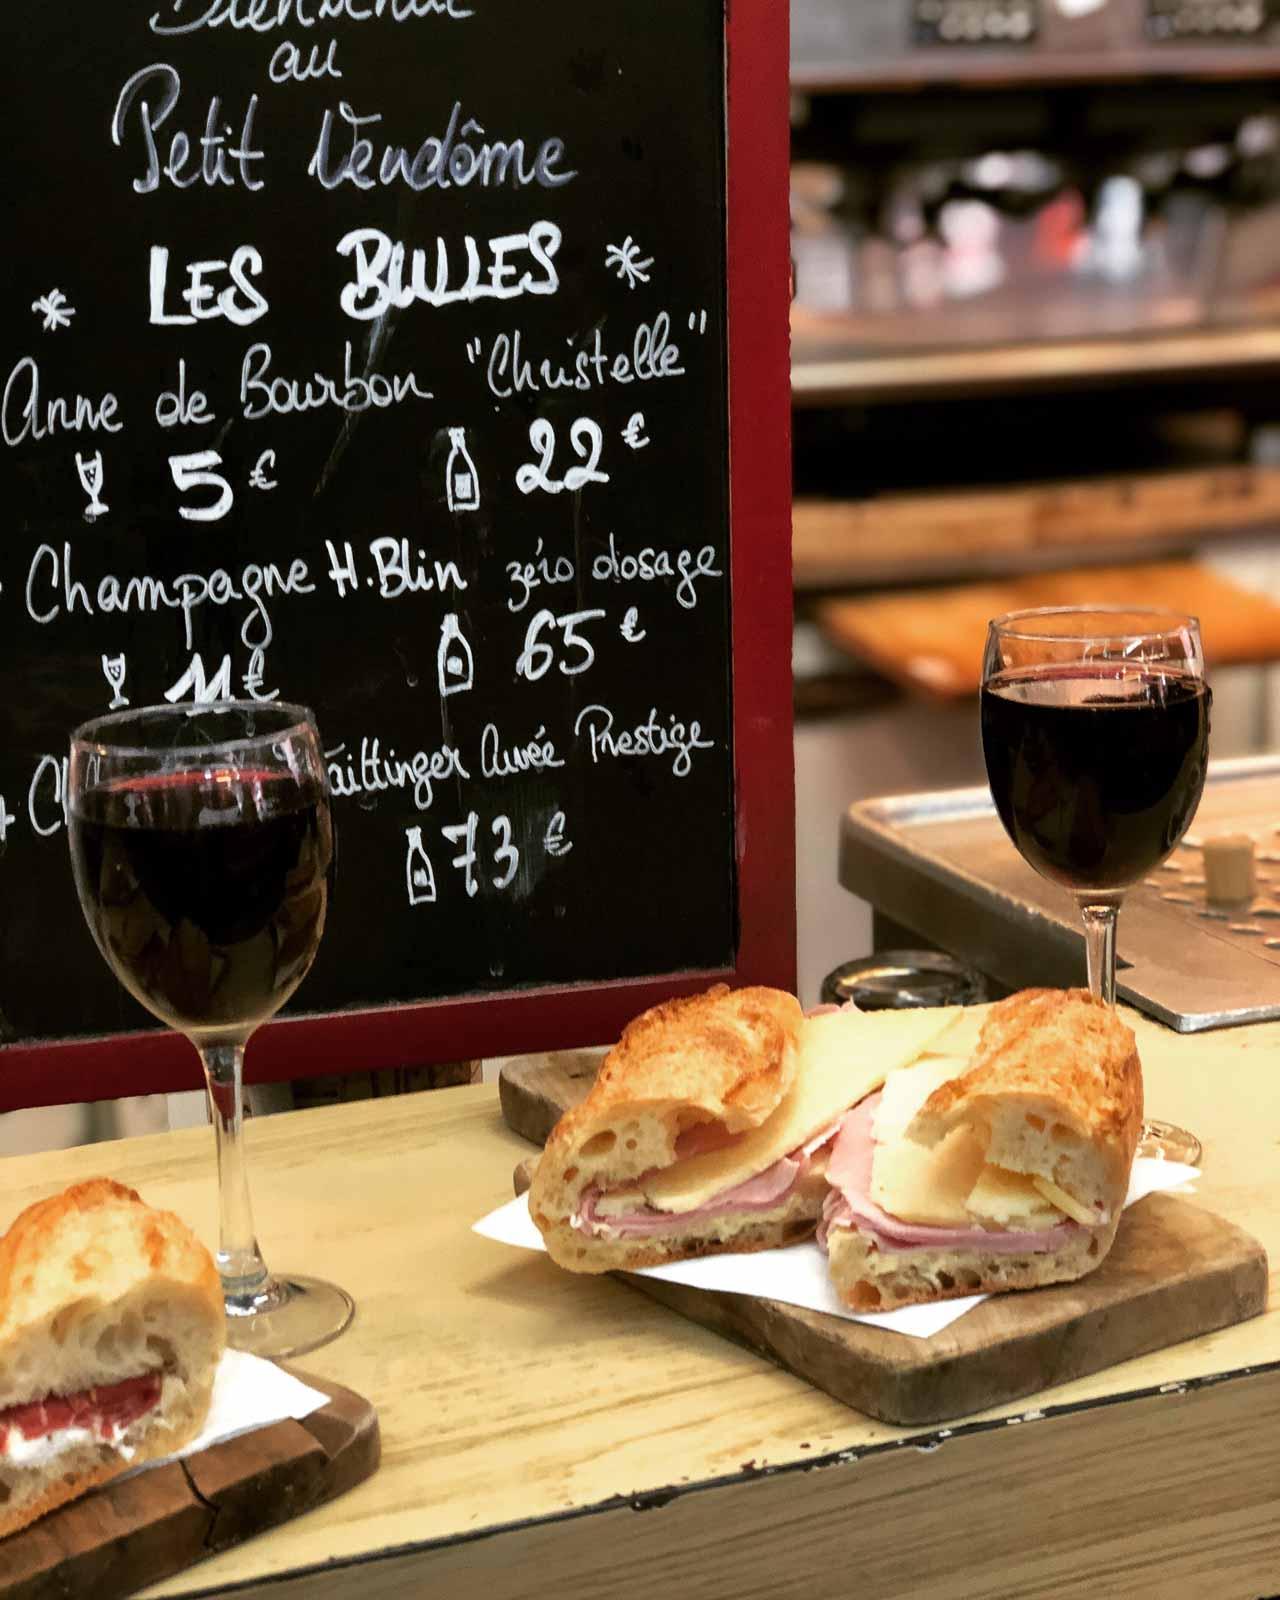 Considered the best sandwich in Paris!